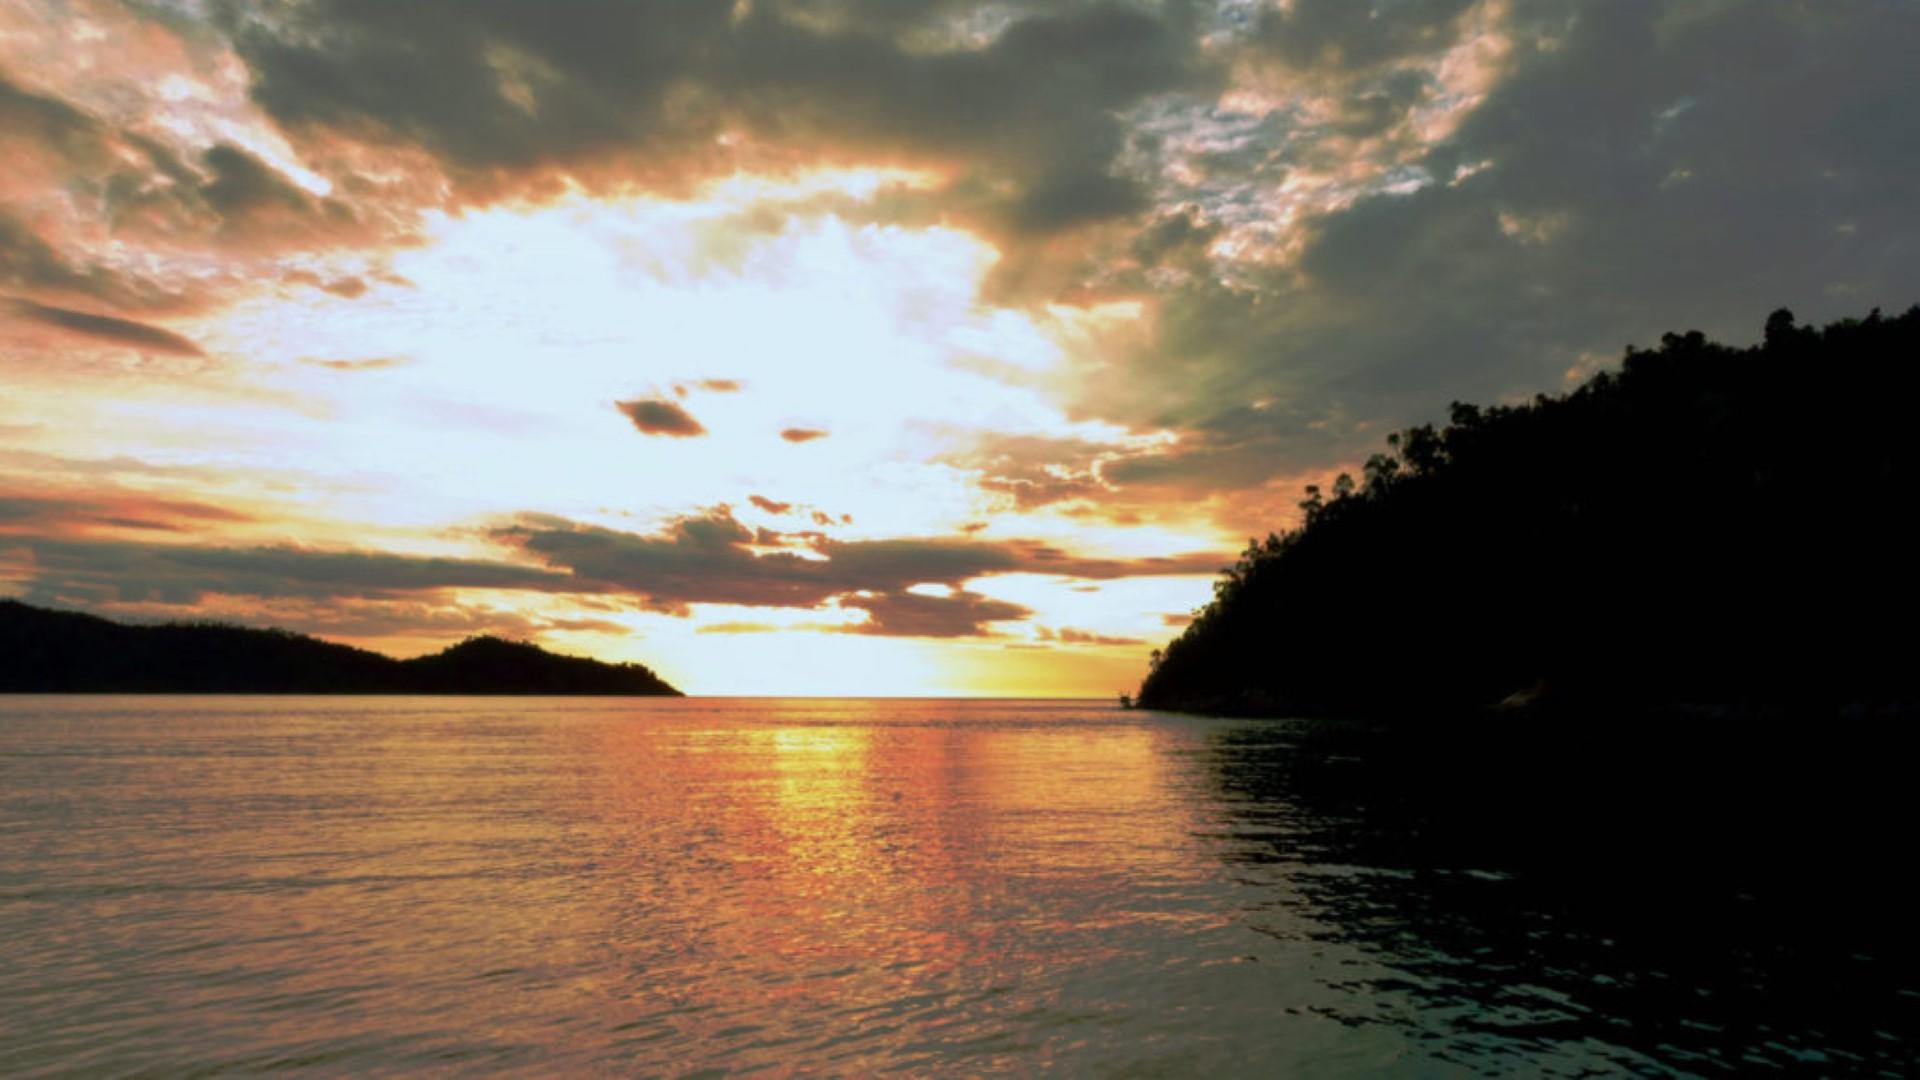 coucher de soleil baramahamay